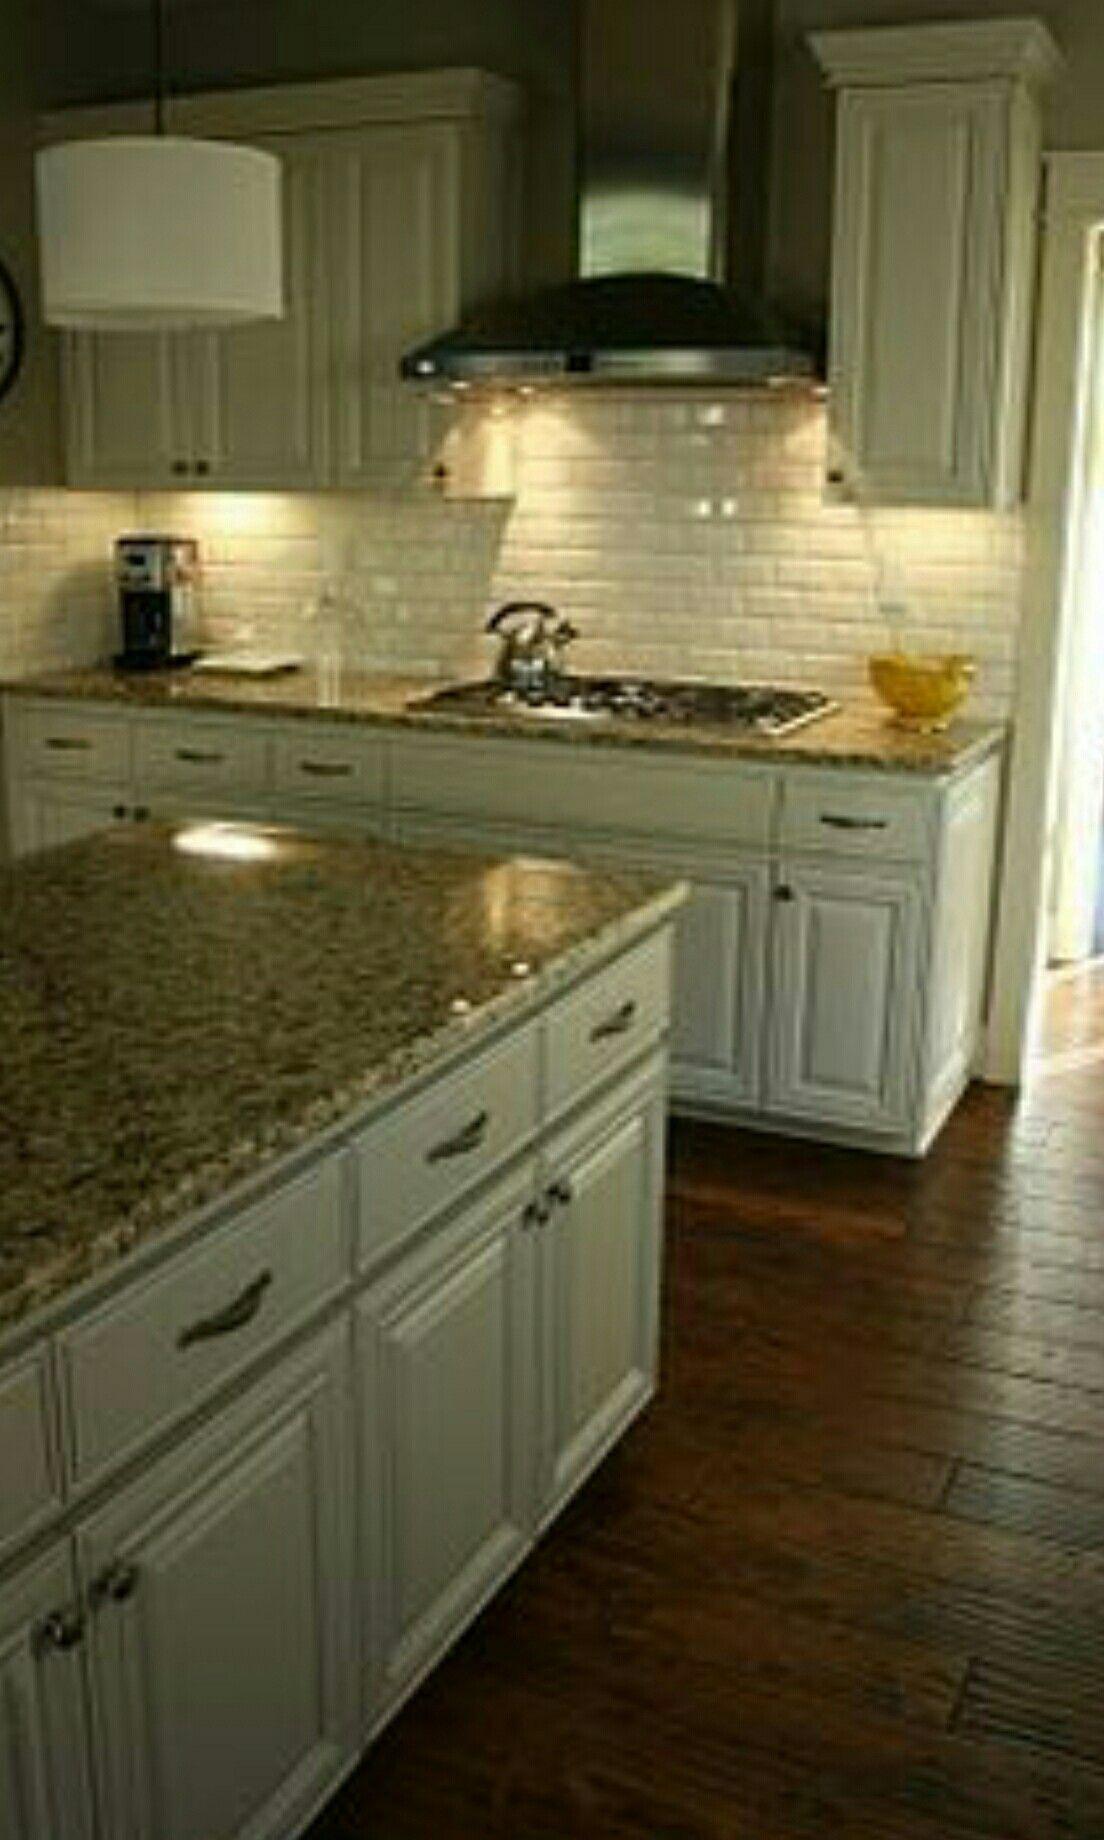 Beige Granite Countertops With White Cabinets And Subway Tile Brown Granite Countertops Kitchen Design Kitchen Renovation